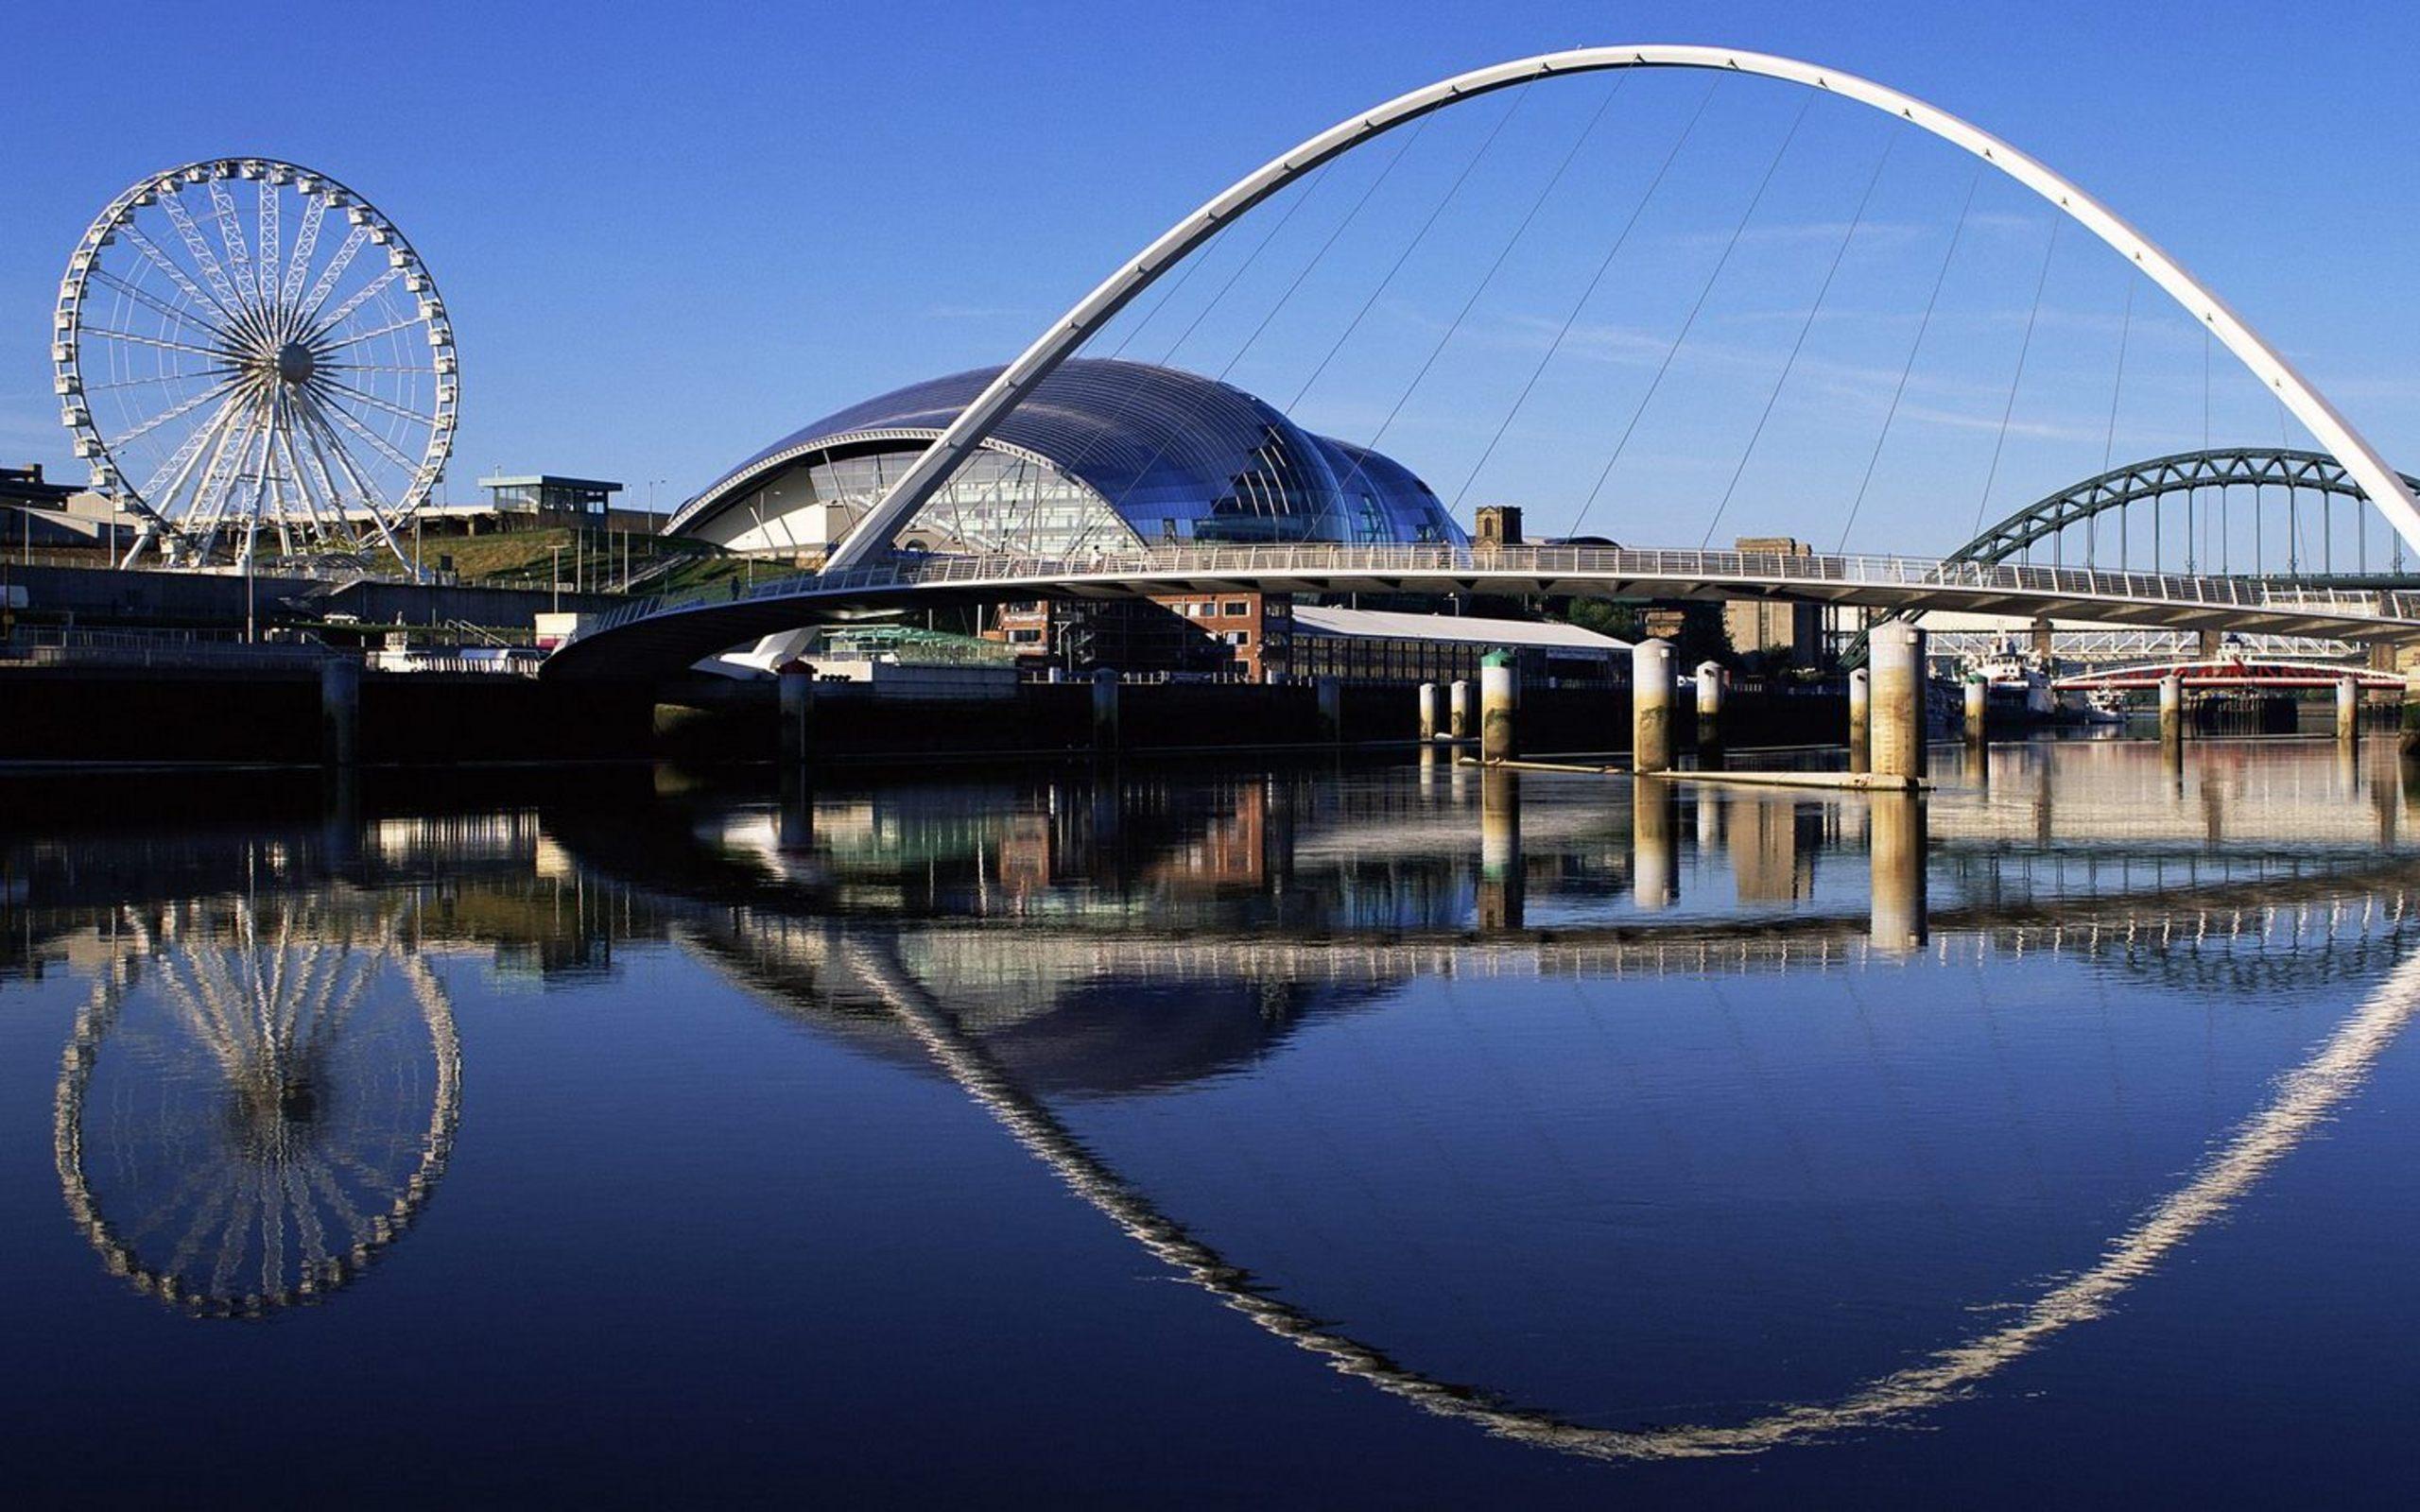 Millennium Bridge Widescreen England Wallpapers HD Wallpapers 2560x1600